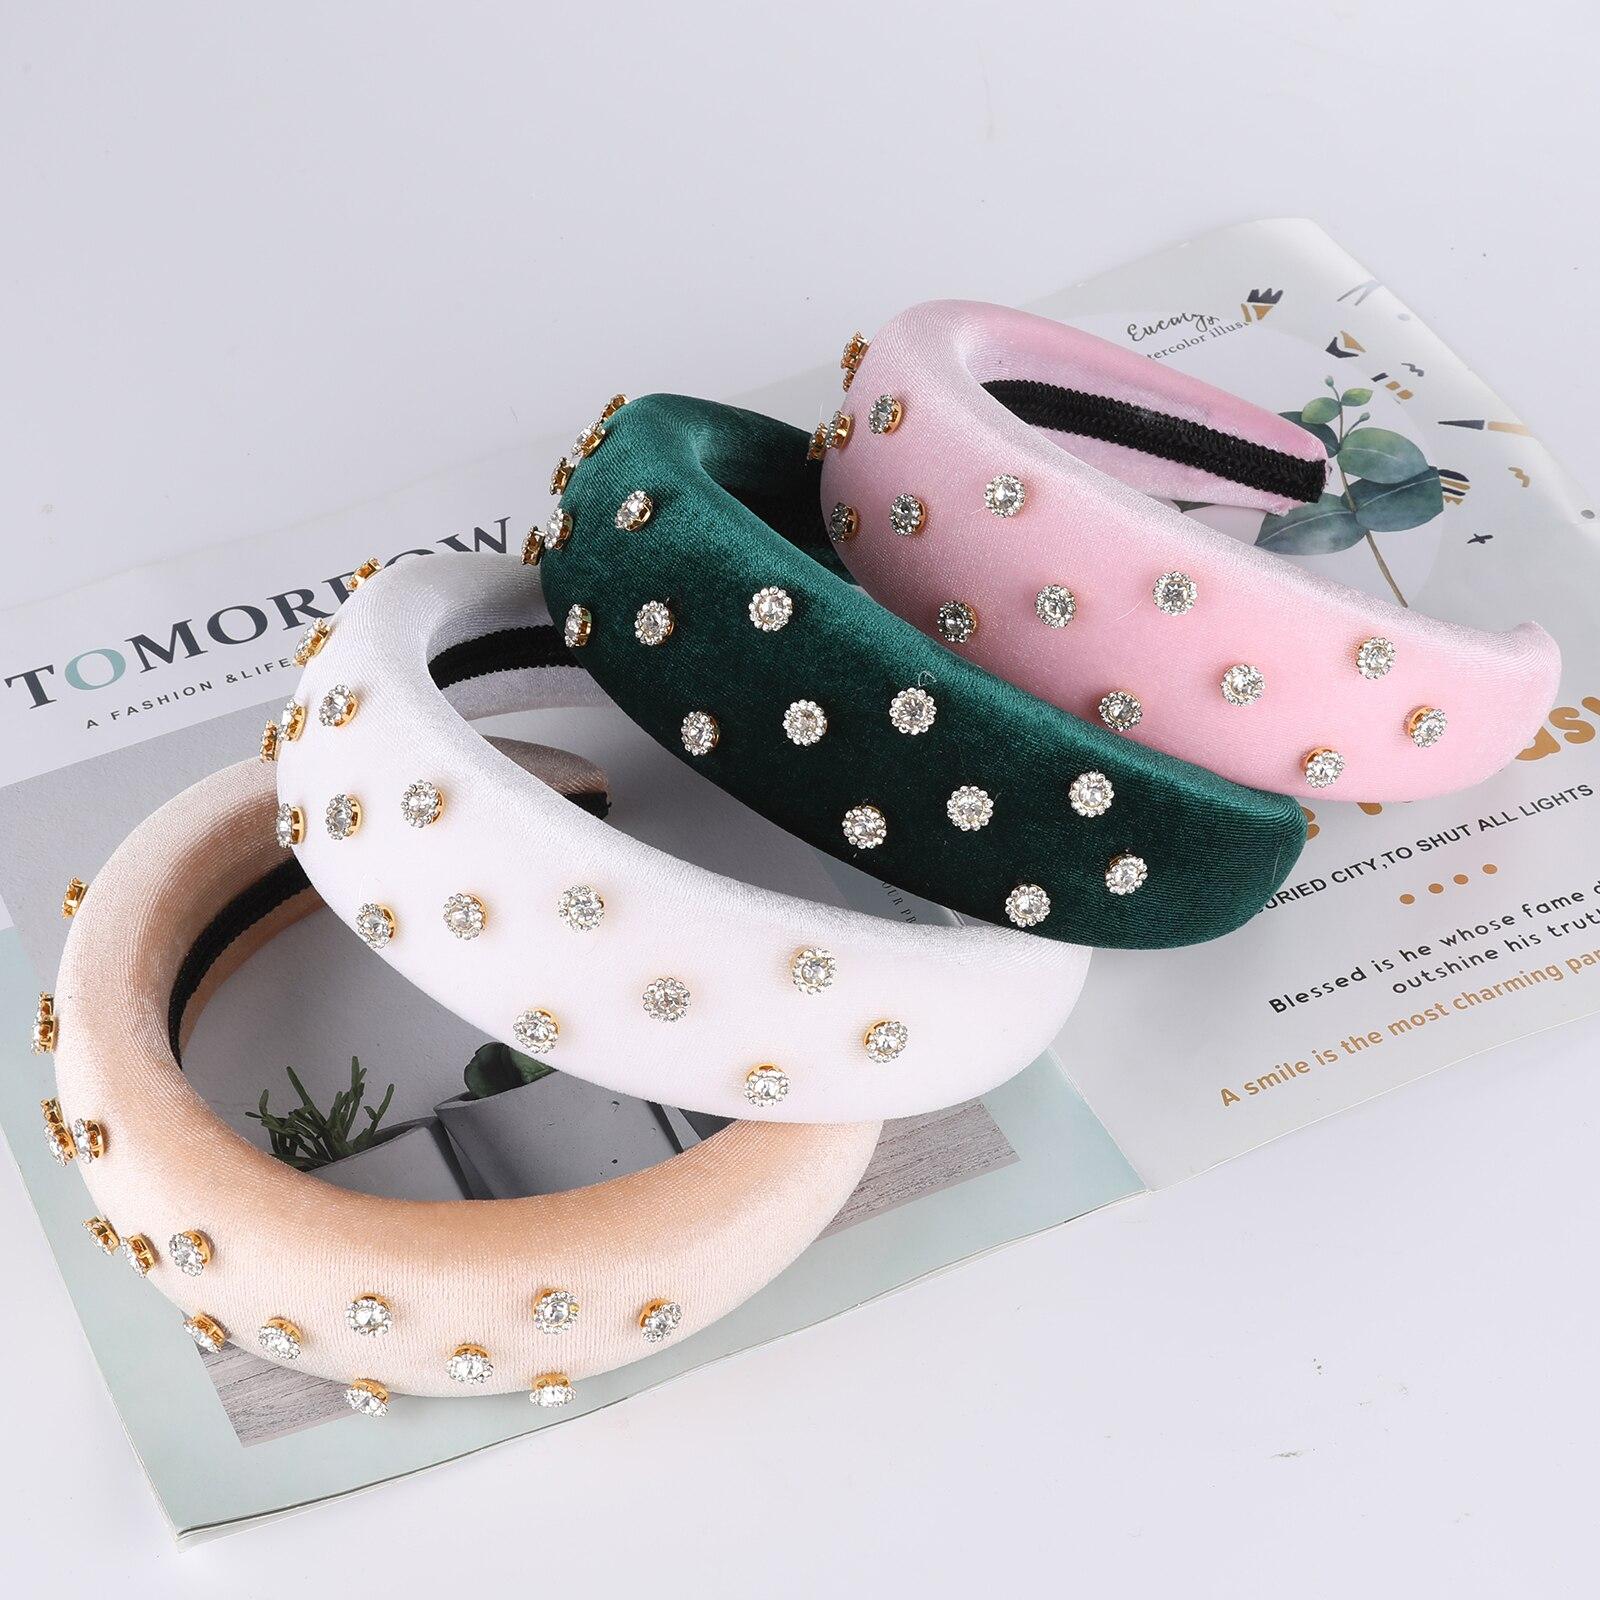 Woven Headband 5 Style 196 No. 100 BLESSING Good Girl Fashion Handicraft B